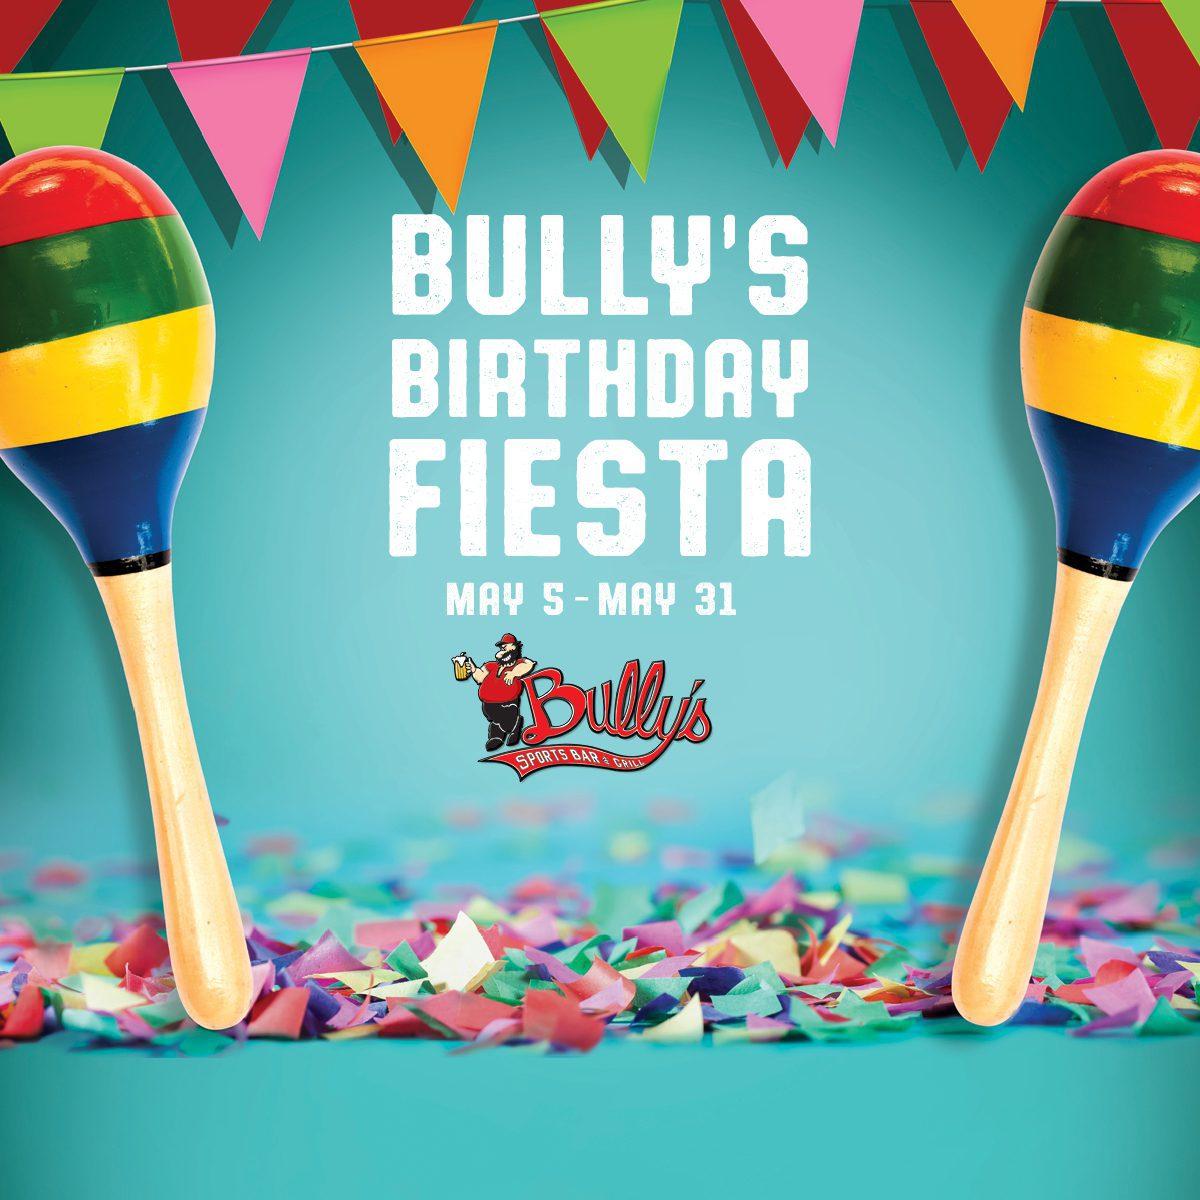 Bully's Birthday Fiesta   May 5 - May 31